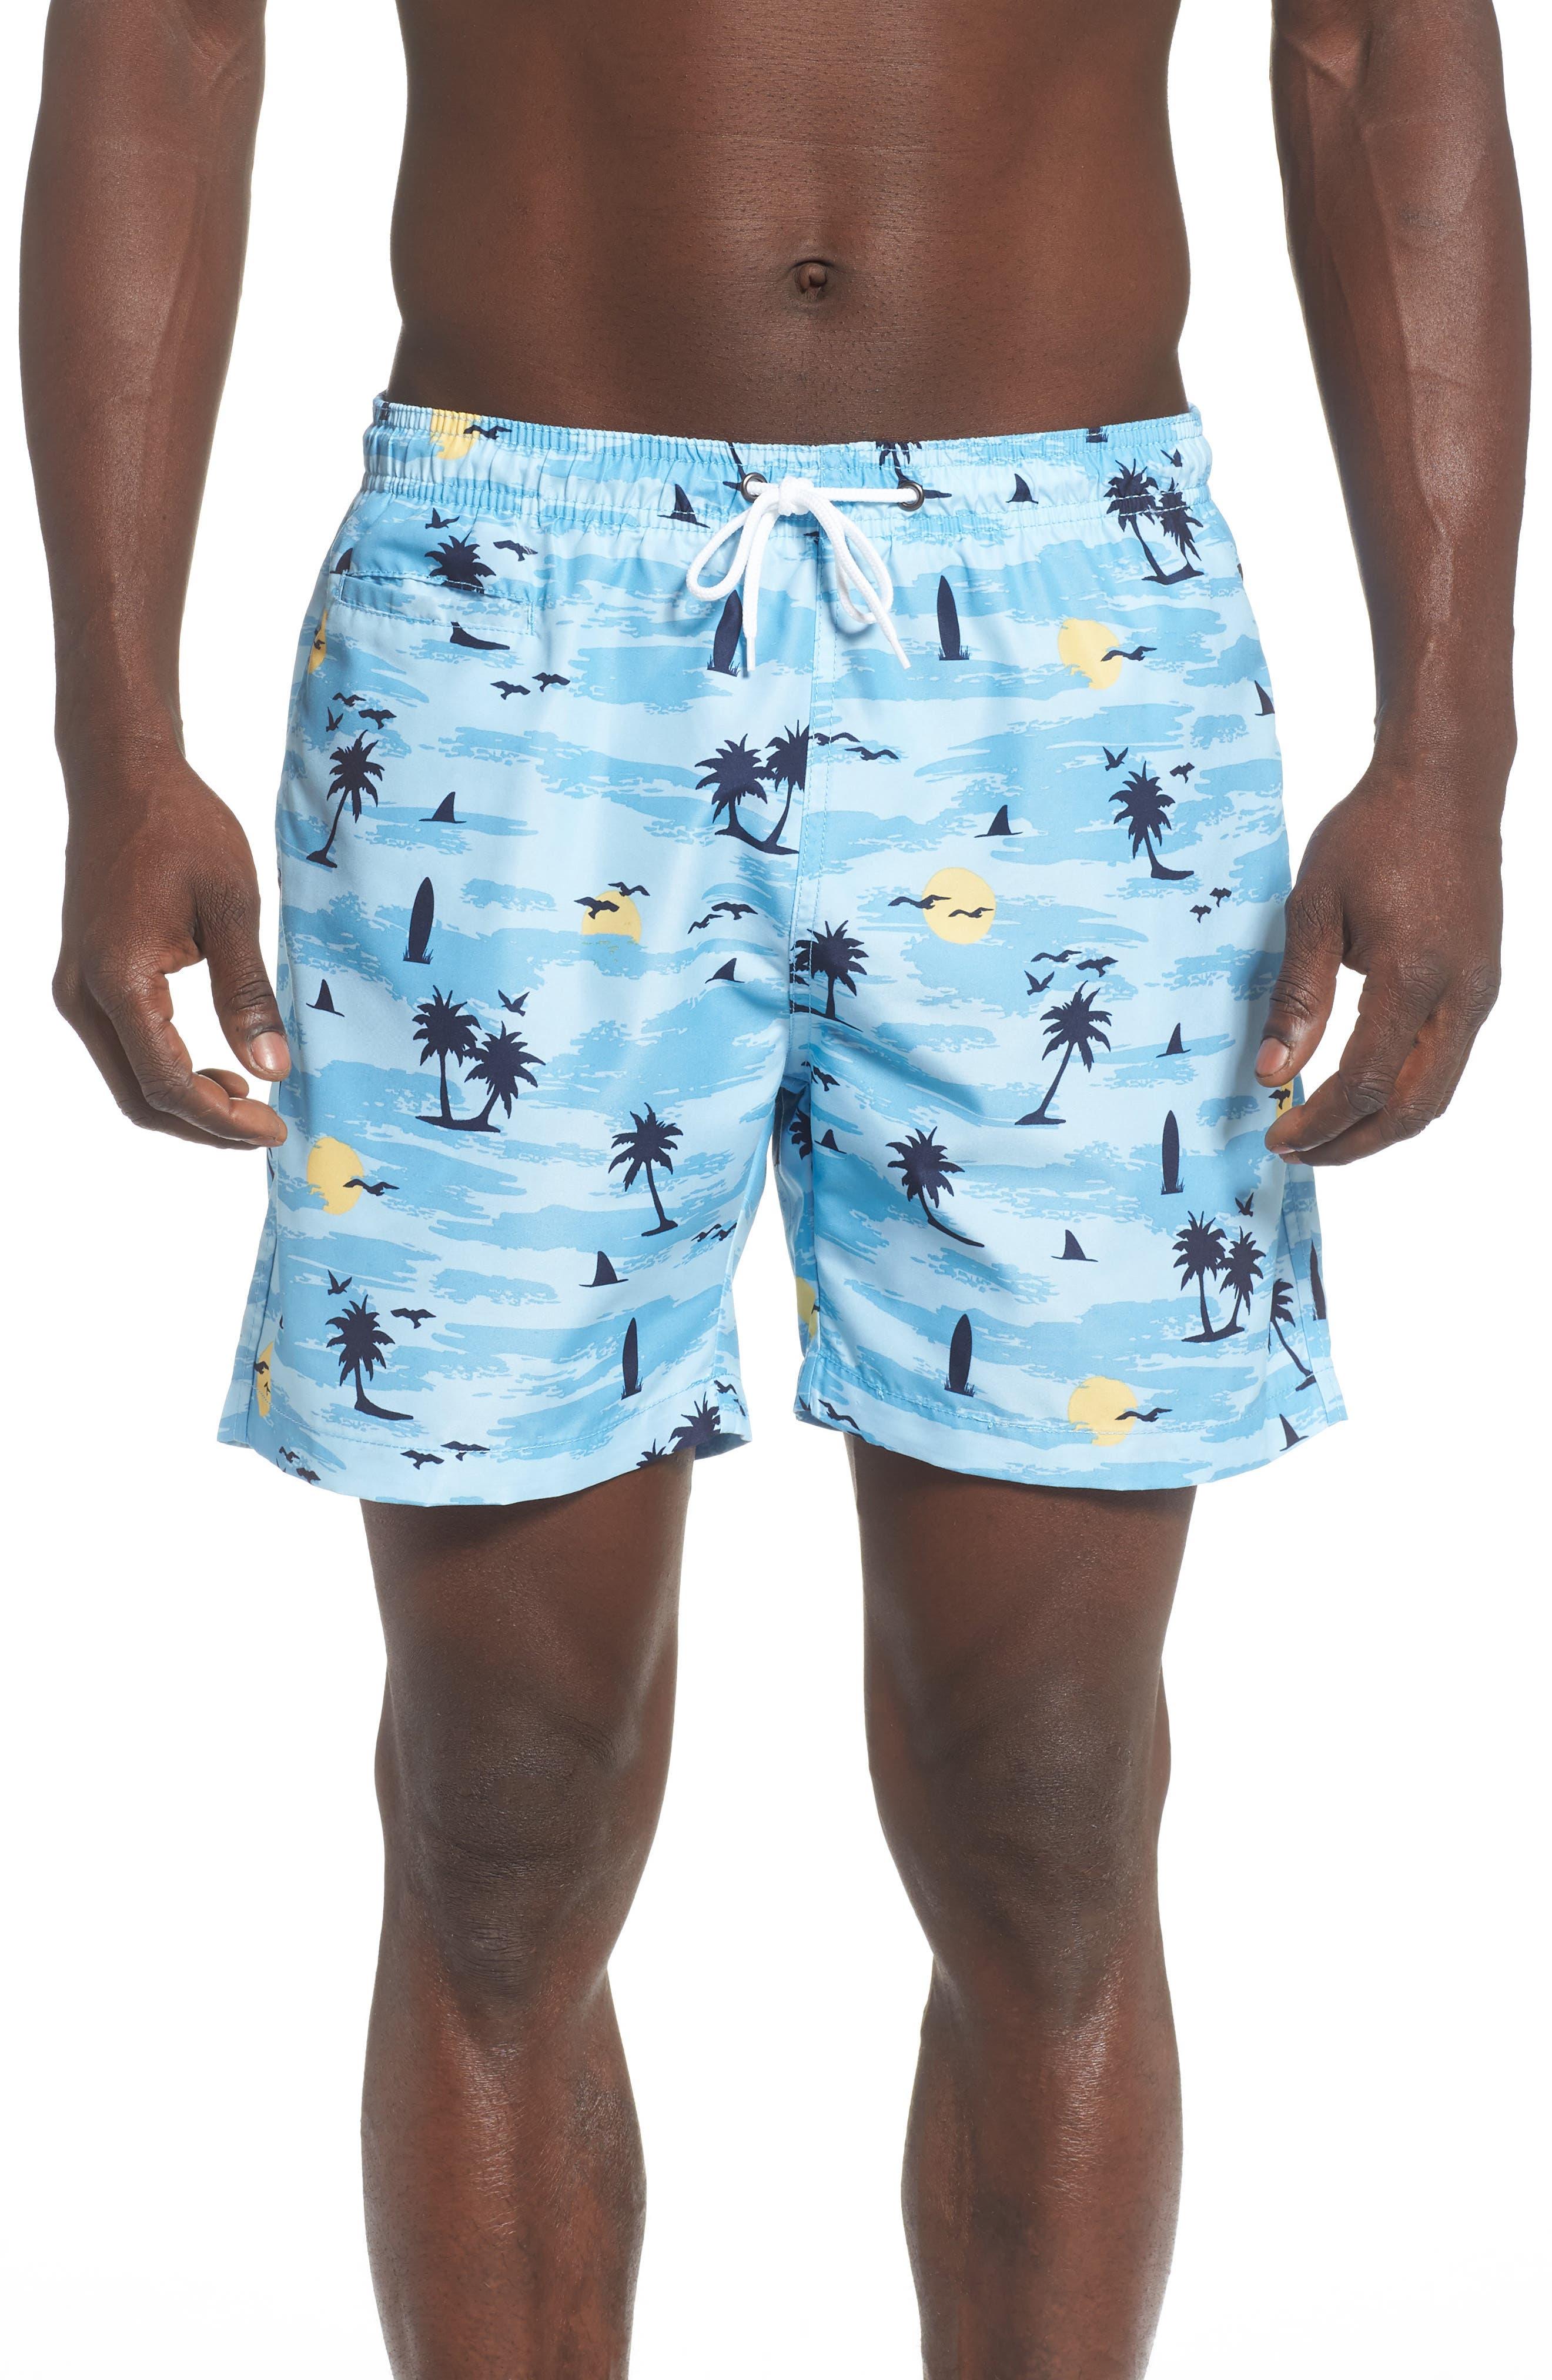 Trunks Surf & Swim Co. Retro Beach Sano Swim Trunks, Blue